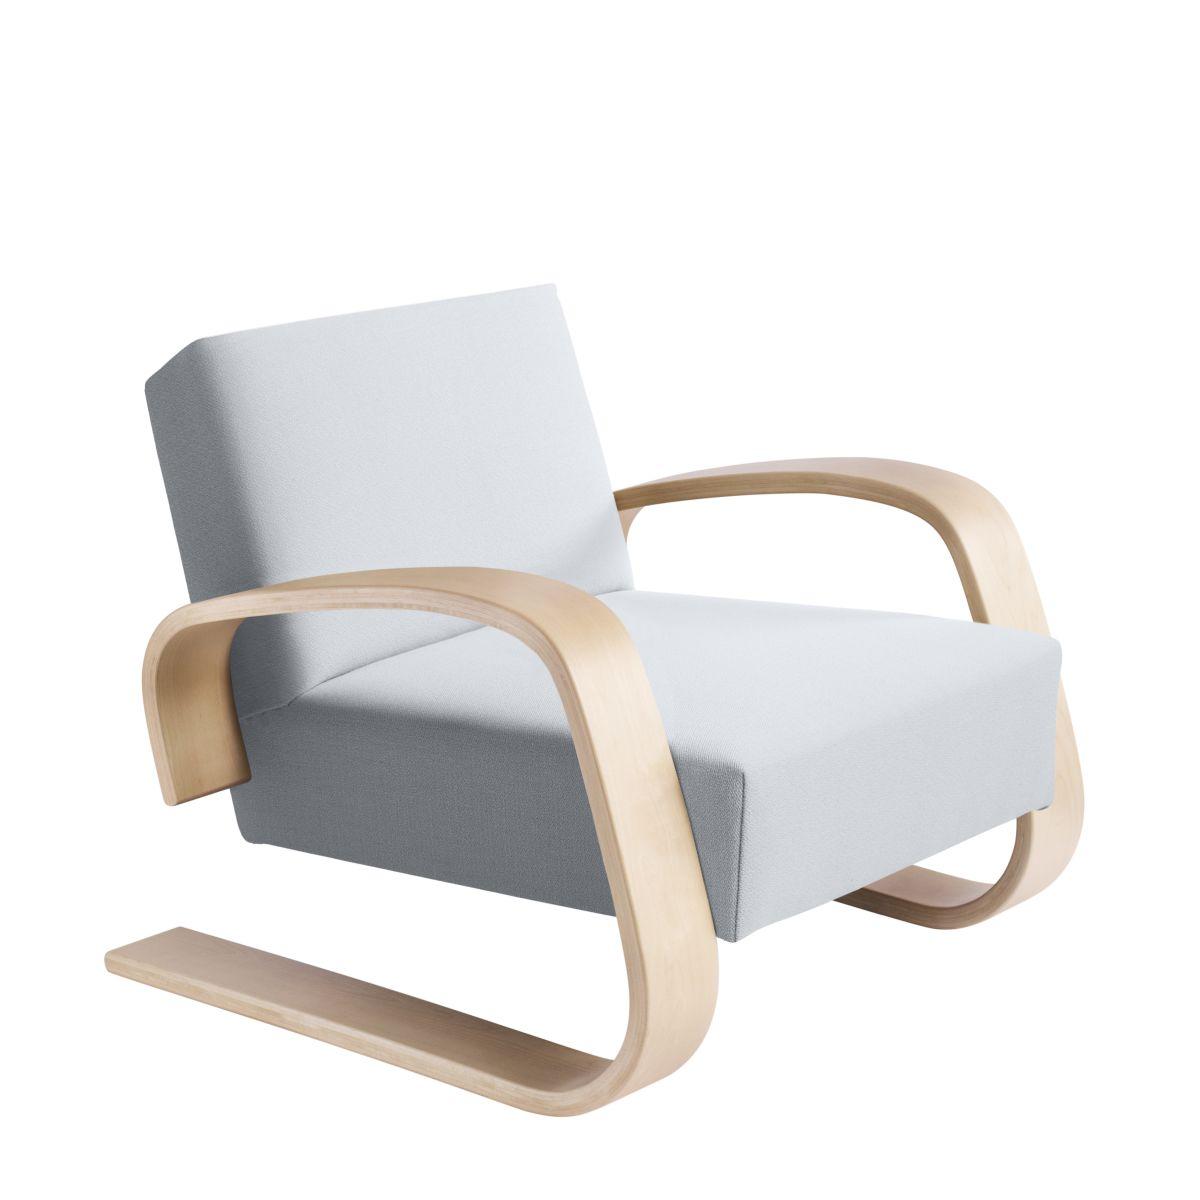 Armchair 400 _Tank  legs clear laquered birch_seat fabric upholstery Artek grey